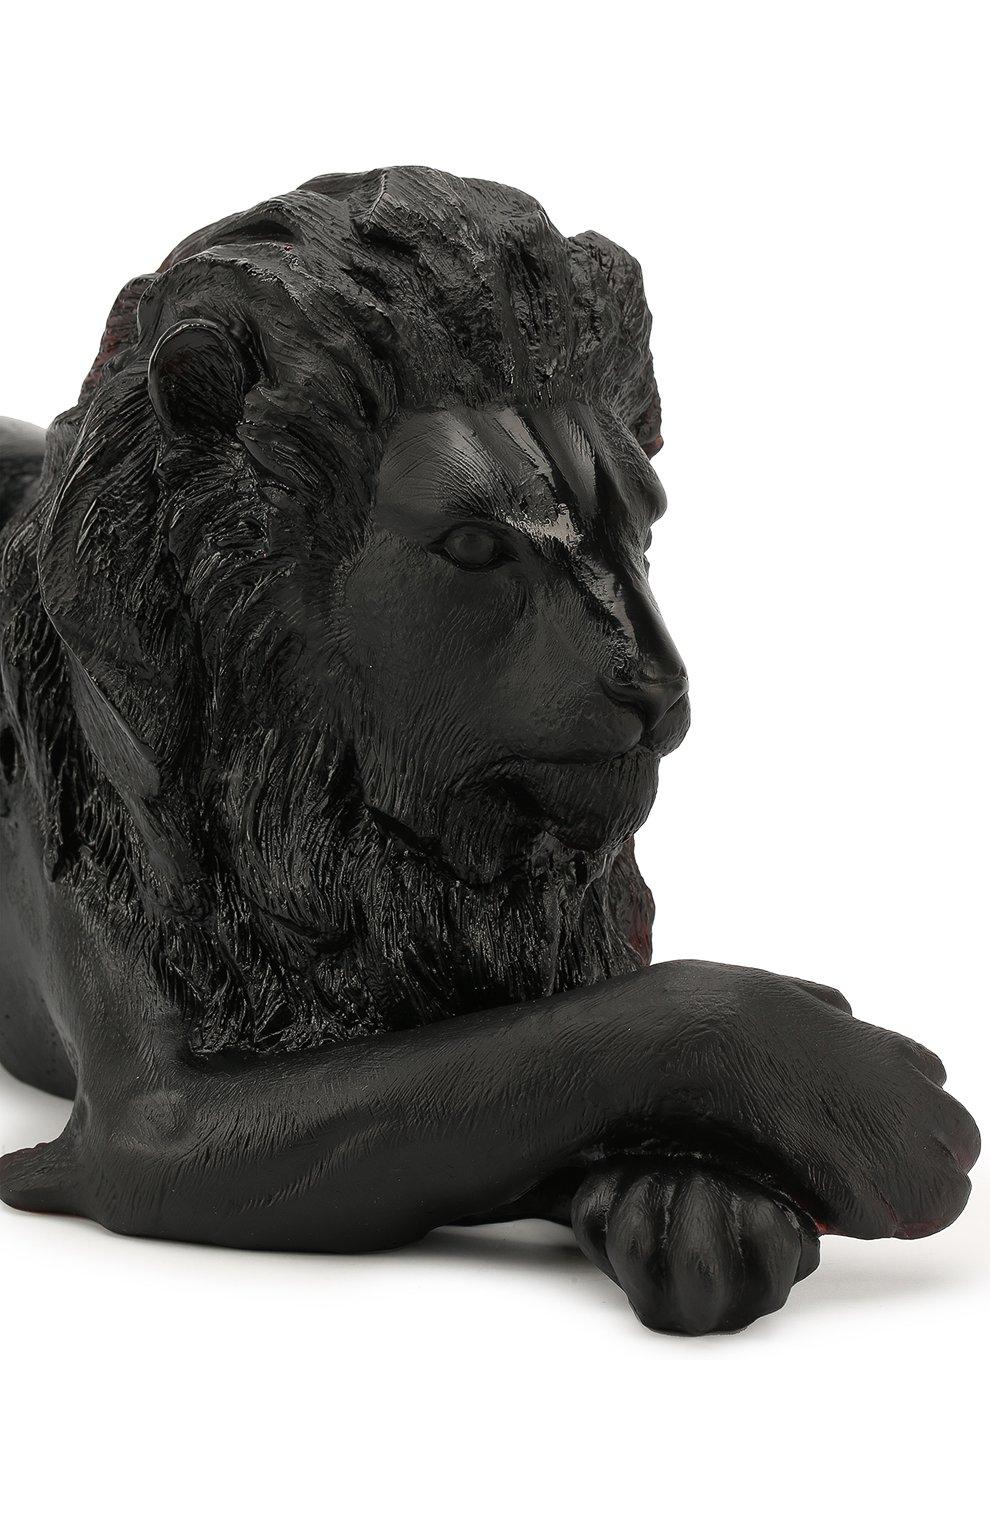 Скульптура Лев Daum  | Фото №2